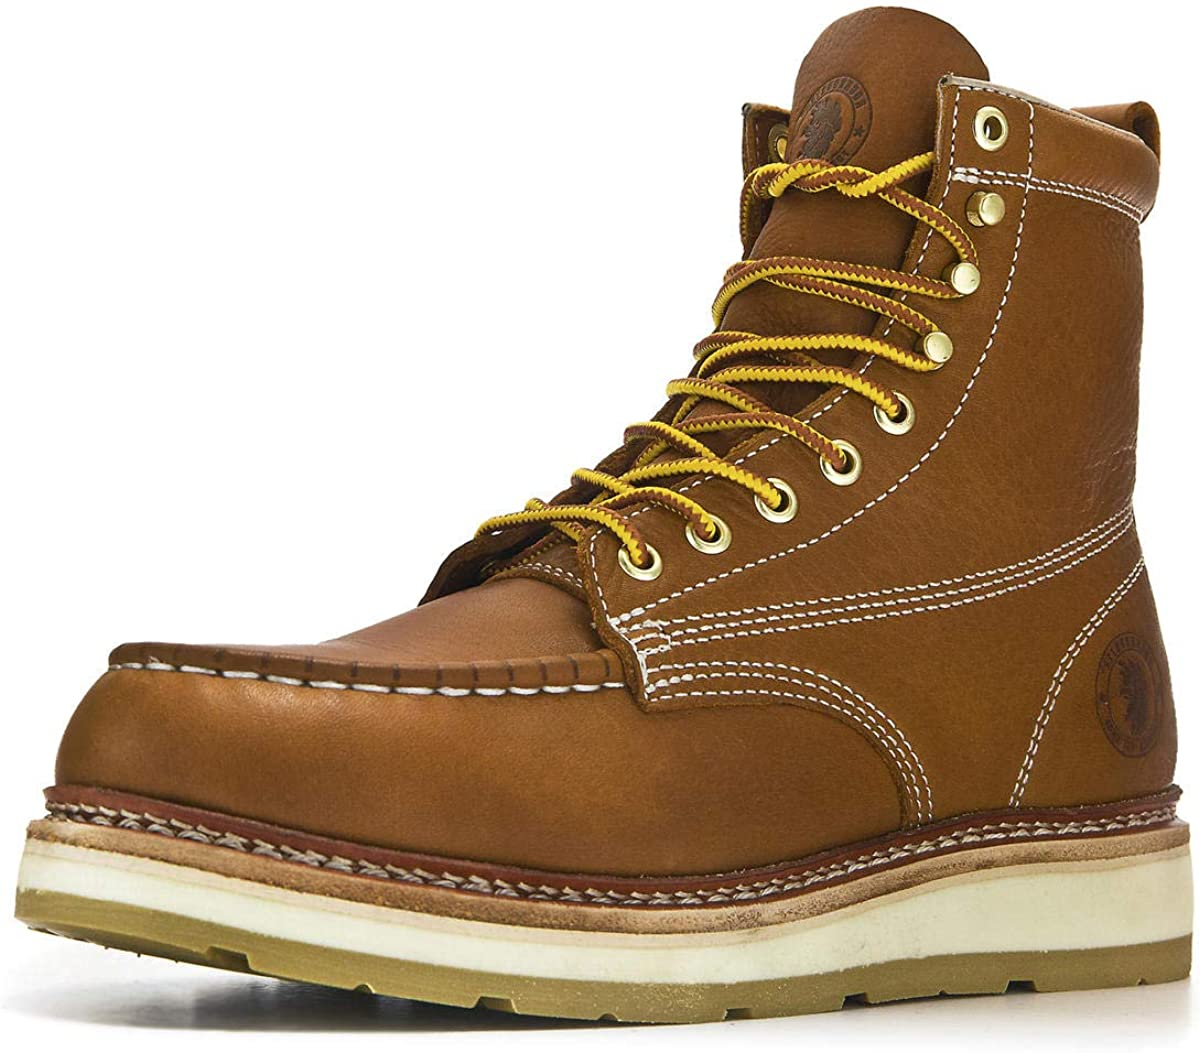 ROCKROOSTER New popularity Norwood Men's Moc Toe Steel Boots Work 7